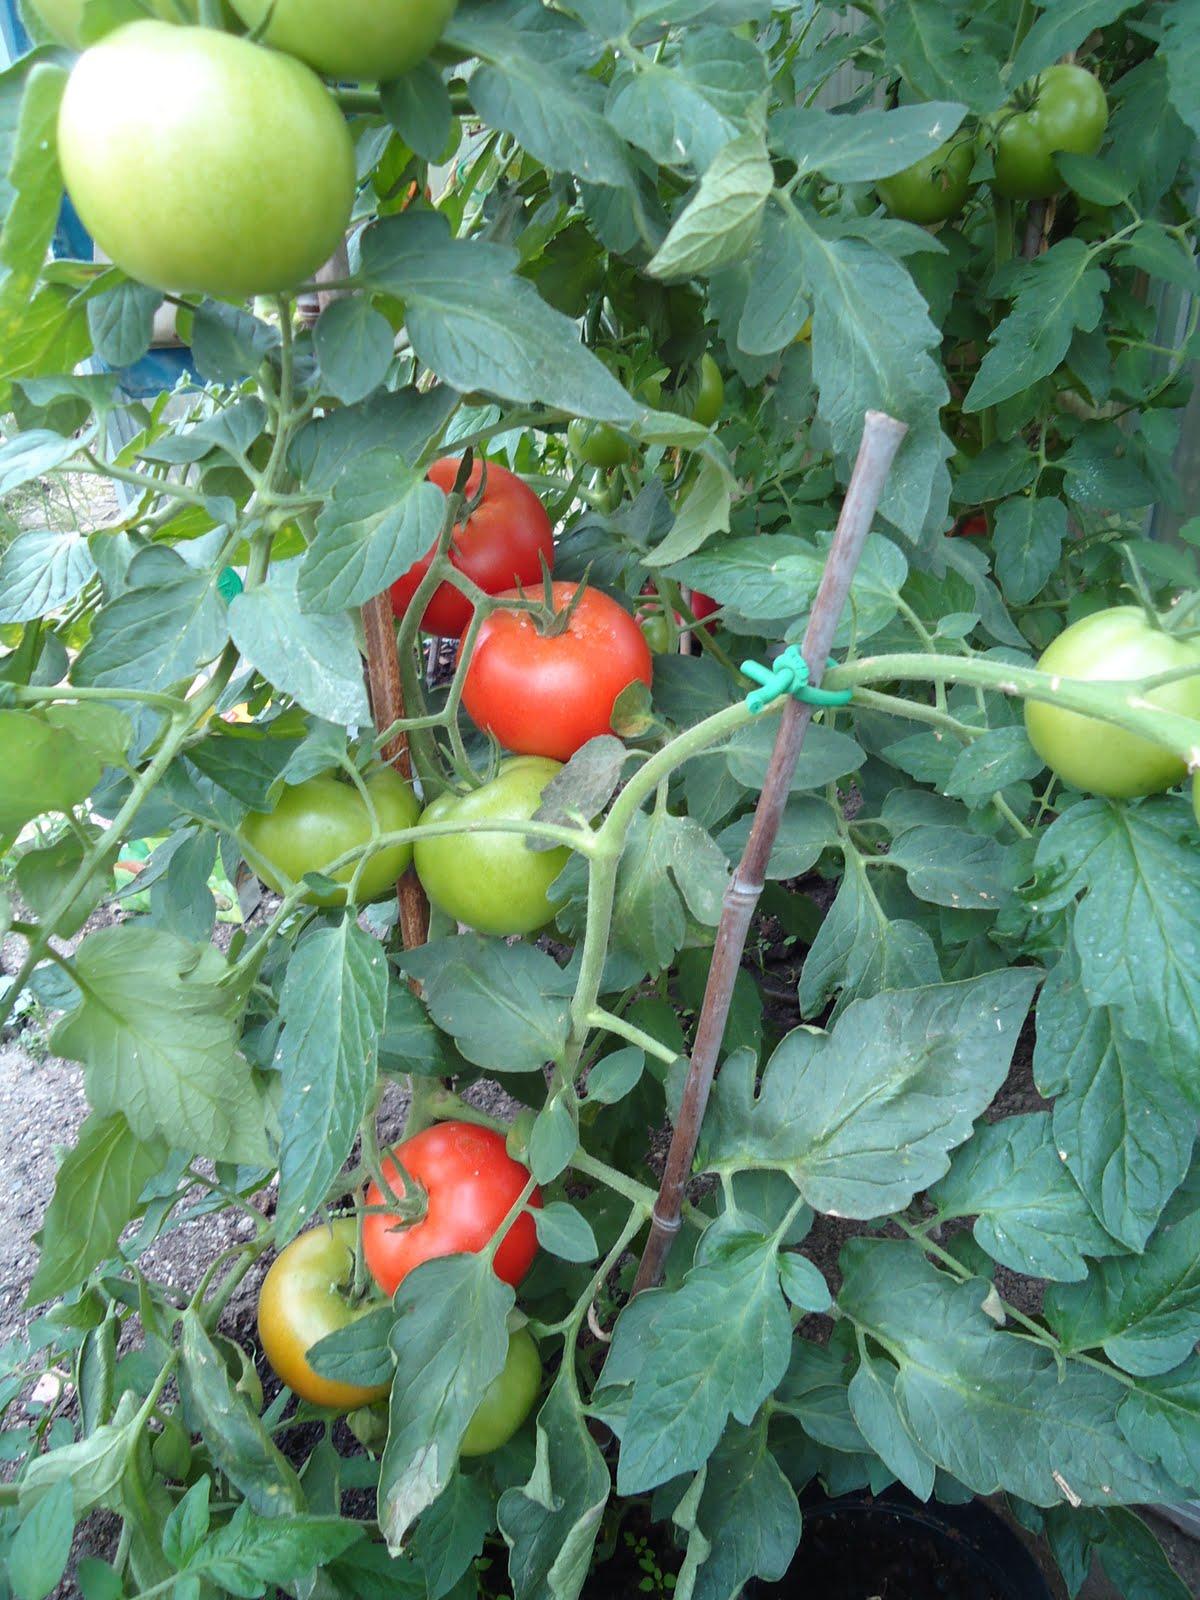 martinas kochk che fruchtiges tomaten chili. Black Bedroom Furniture Sets. Home Design Ideas